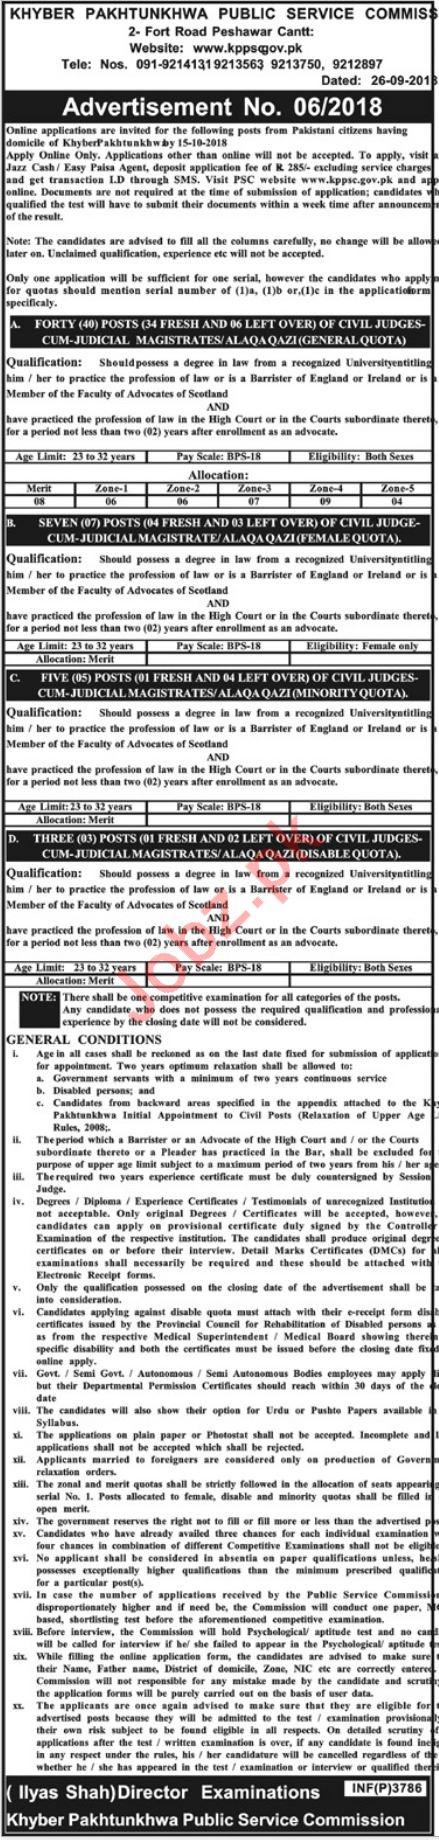 Khyber Pakhtunkhwa Public Service Commission KPPSC Jobs 2018 2021 Job Advertisement Pakistan